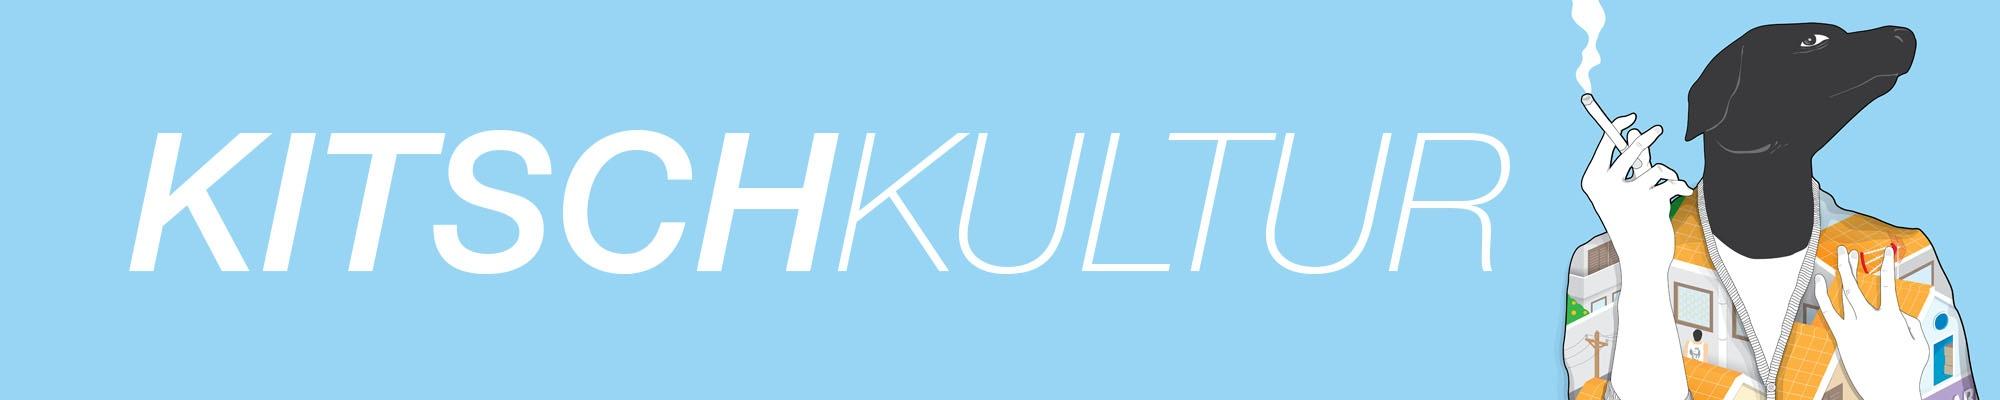 kitschkultur Cover